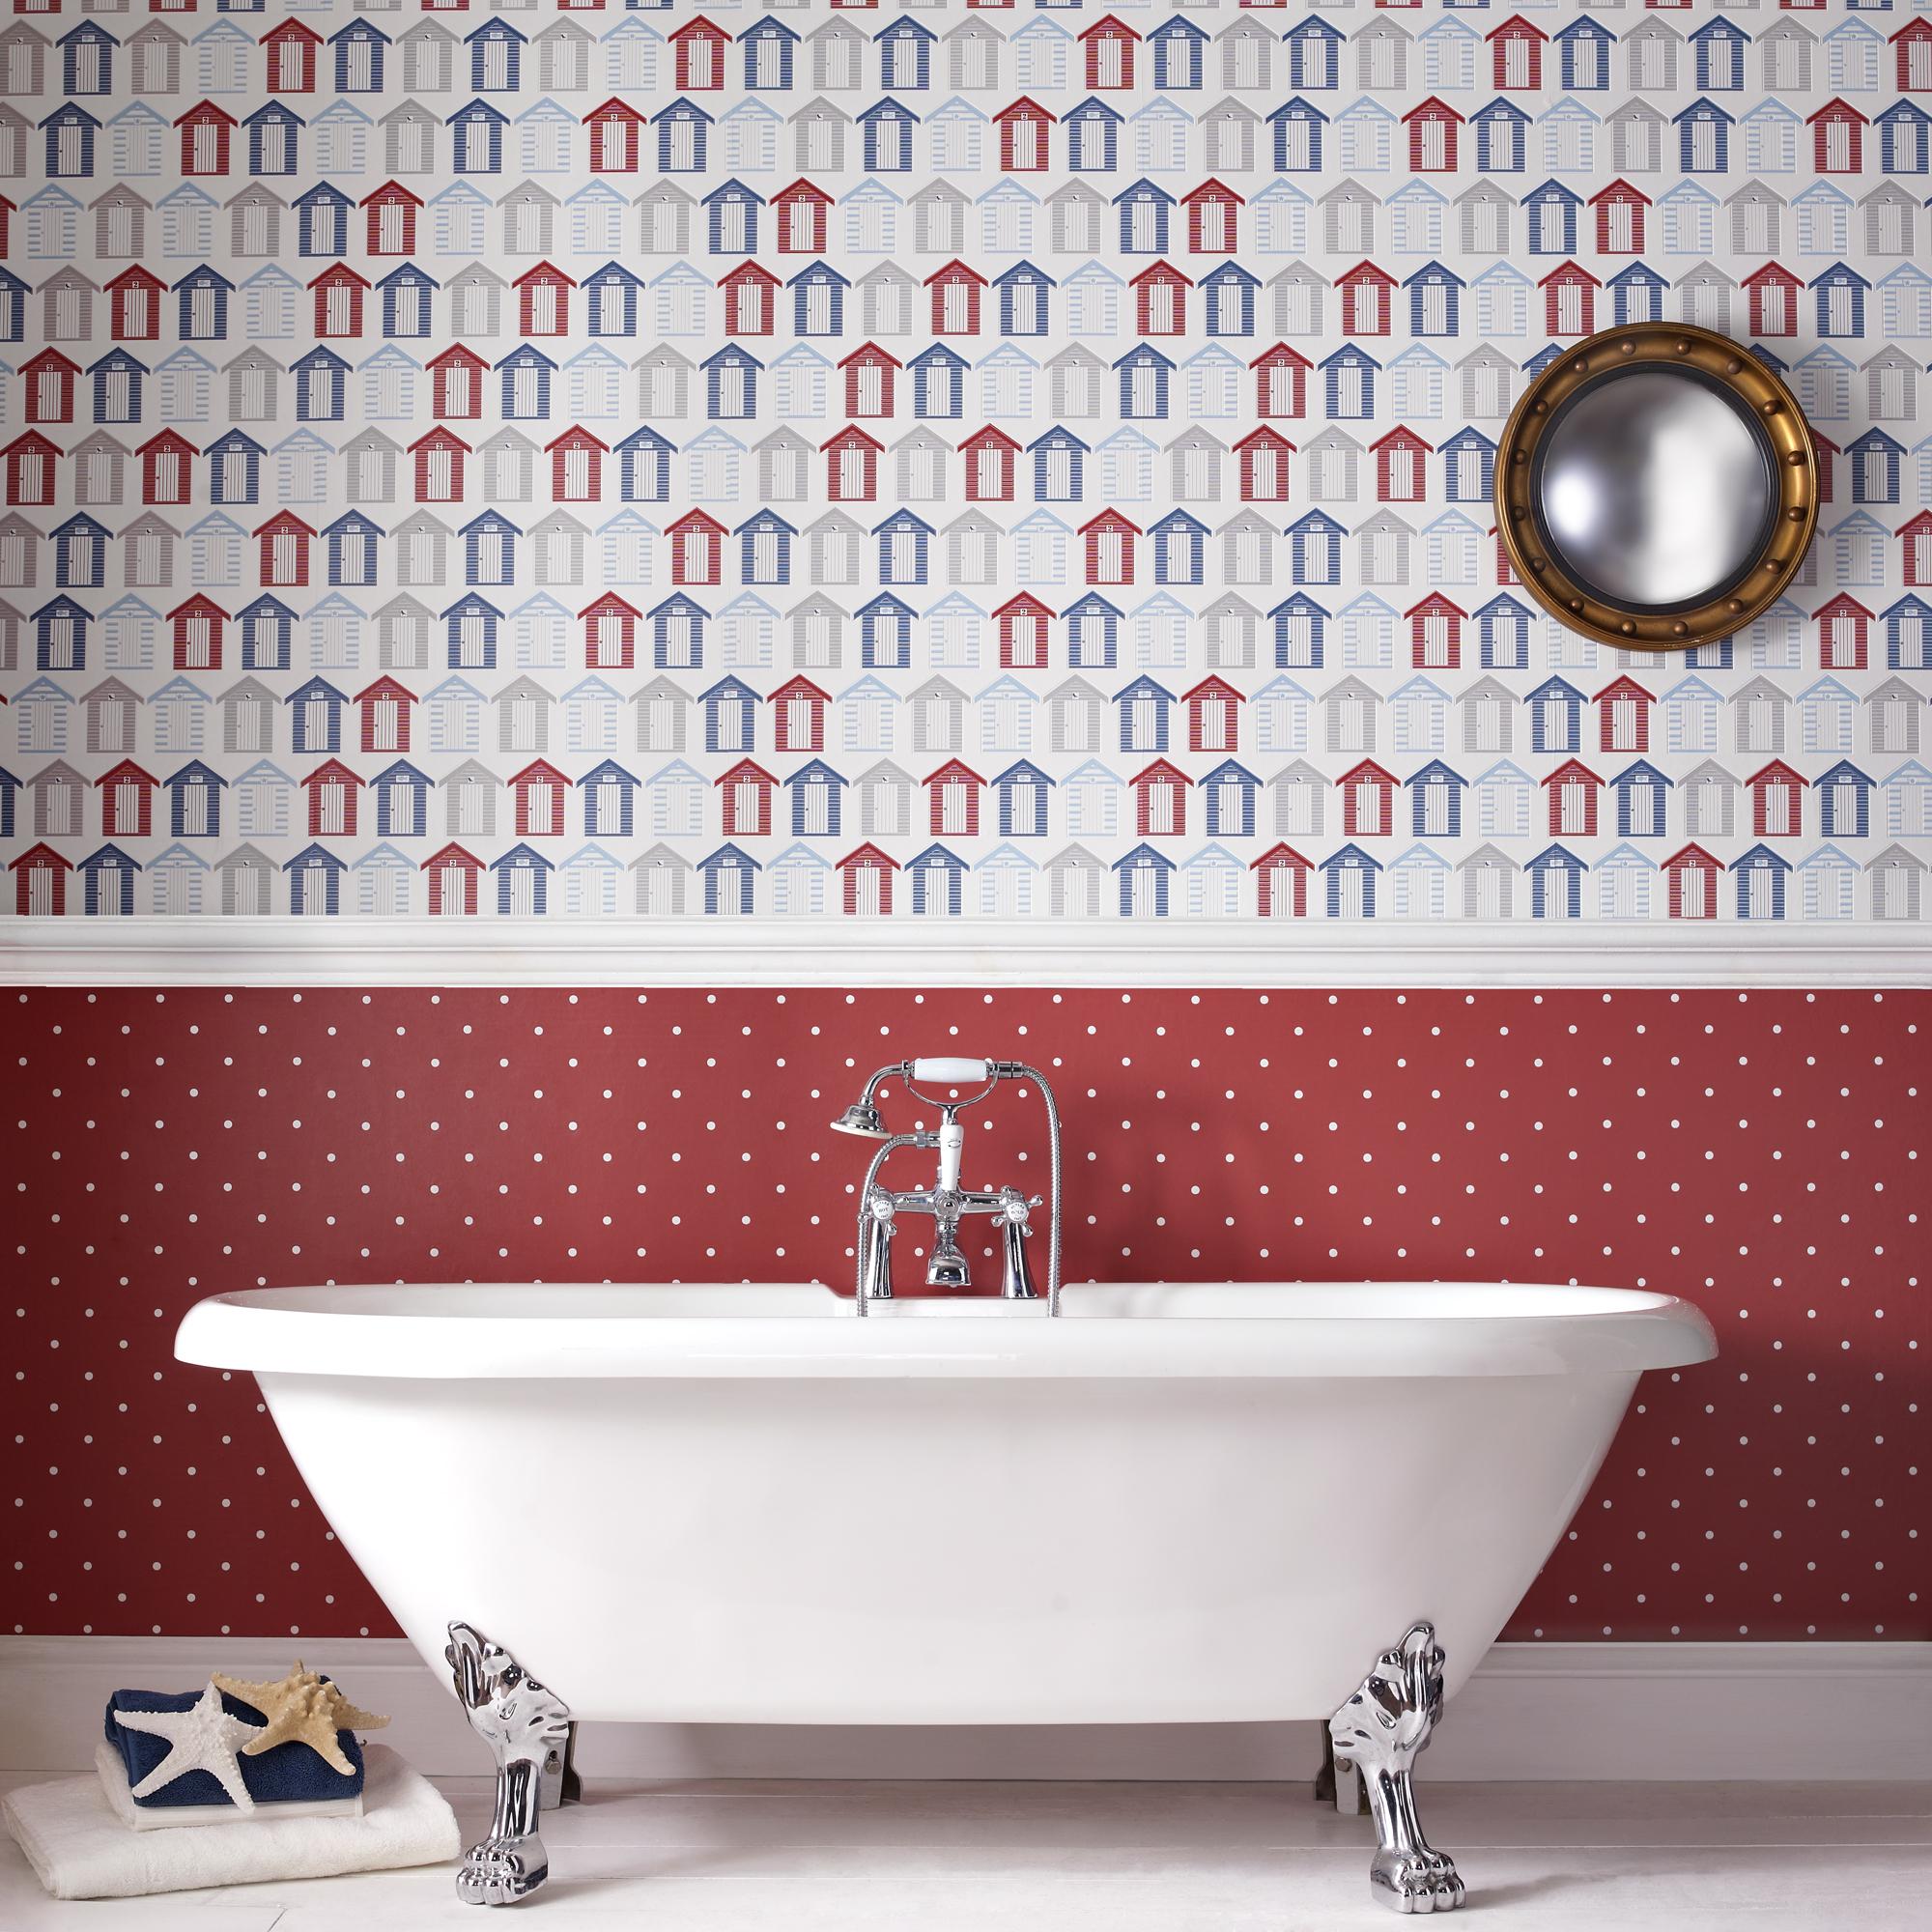 Graham Brown Kitchen Bathroom Wallpaper: The Treasure Hunter - Well-designed